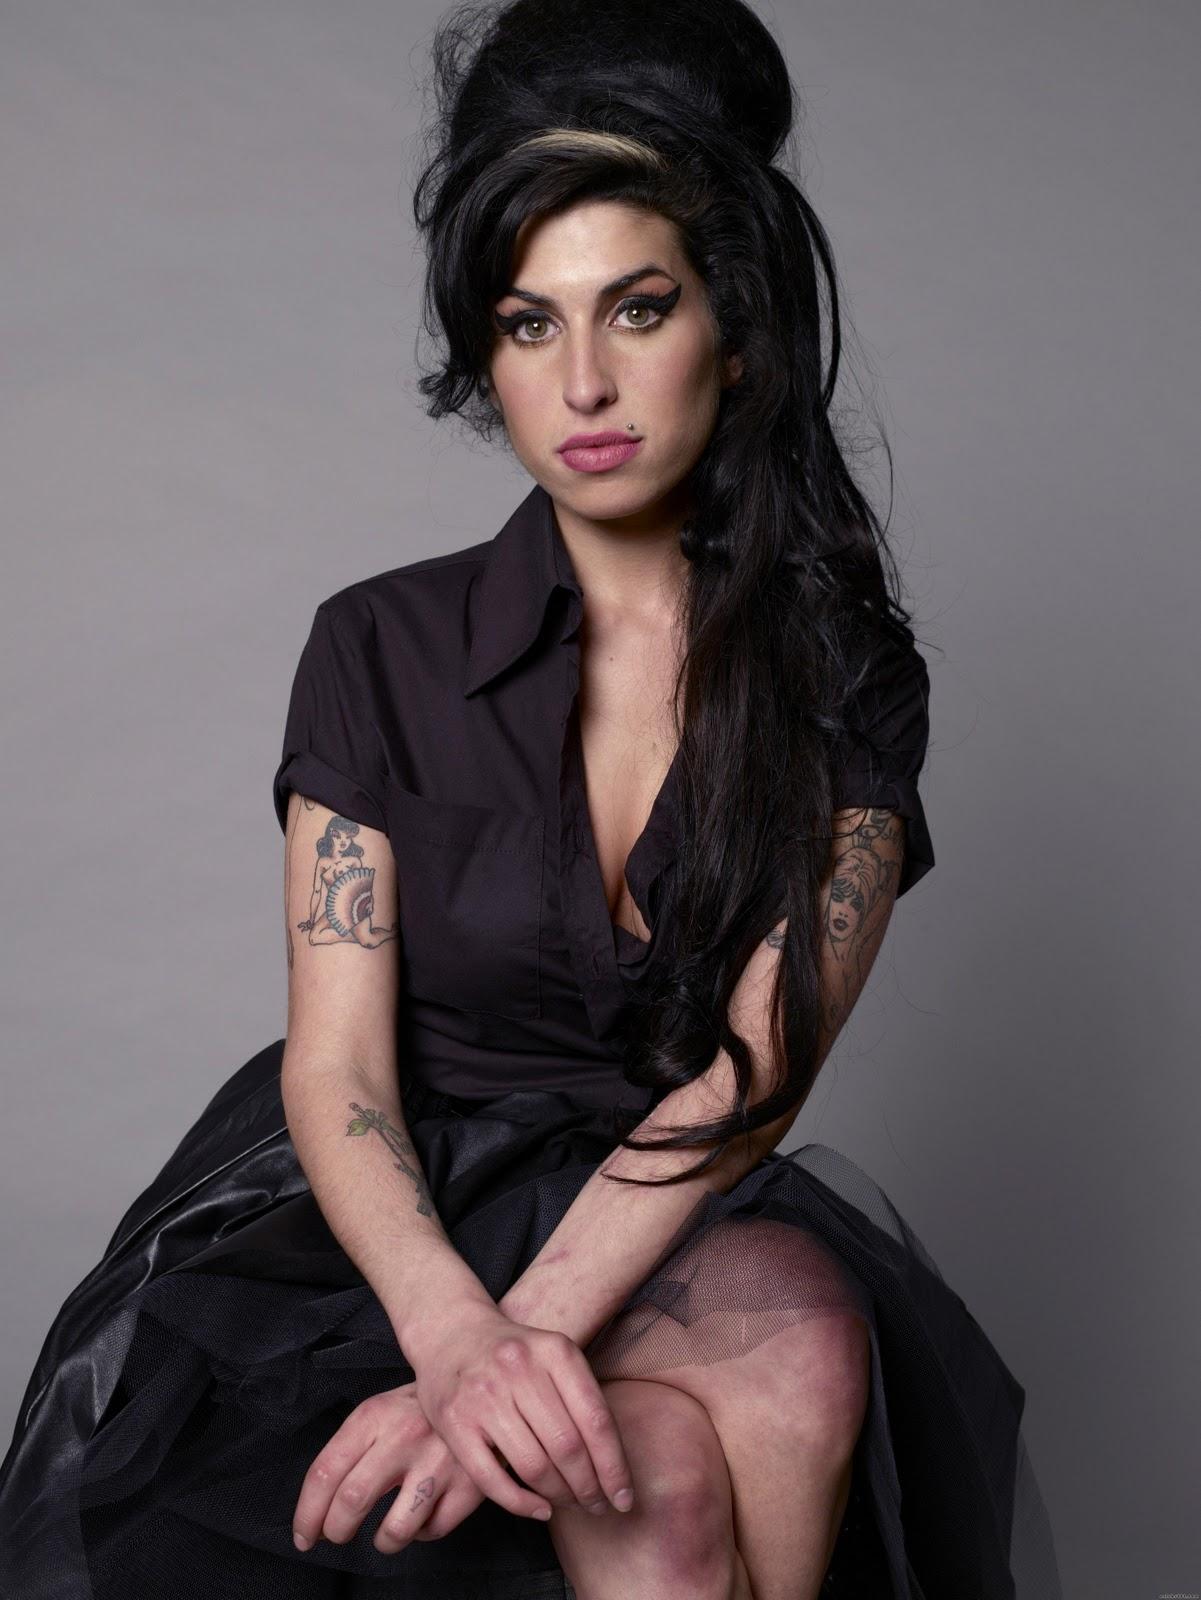 http://1.bp.blogspot.com/-v39yNzH9yQ8/Tzk-eyGzLHI/AAAAAAAACGI/-YkLn0gGu3w/s1600/Amy_Winehouse_4.jpg